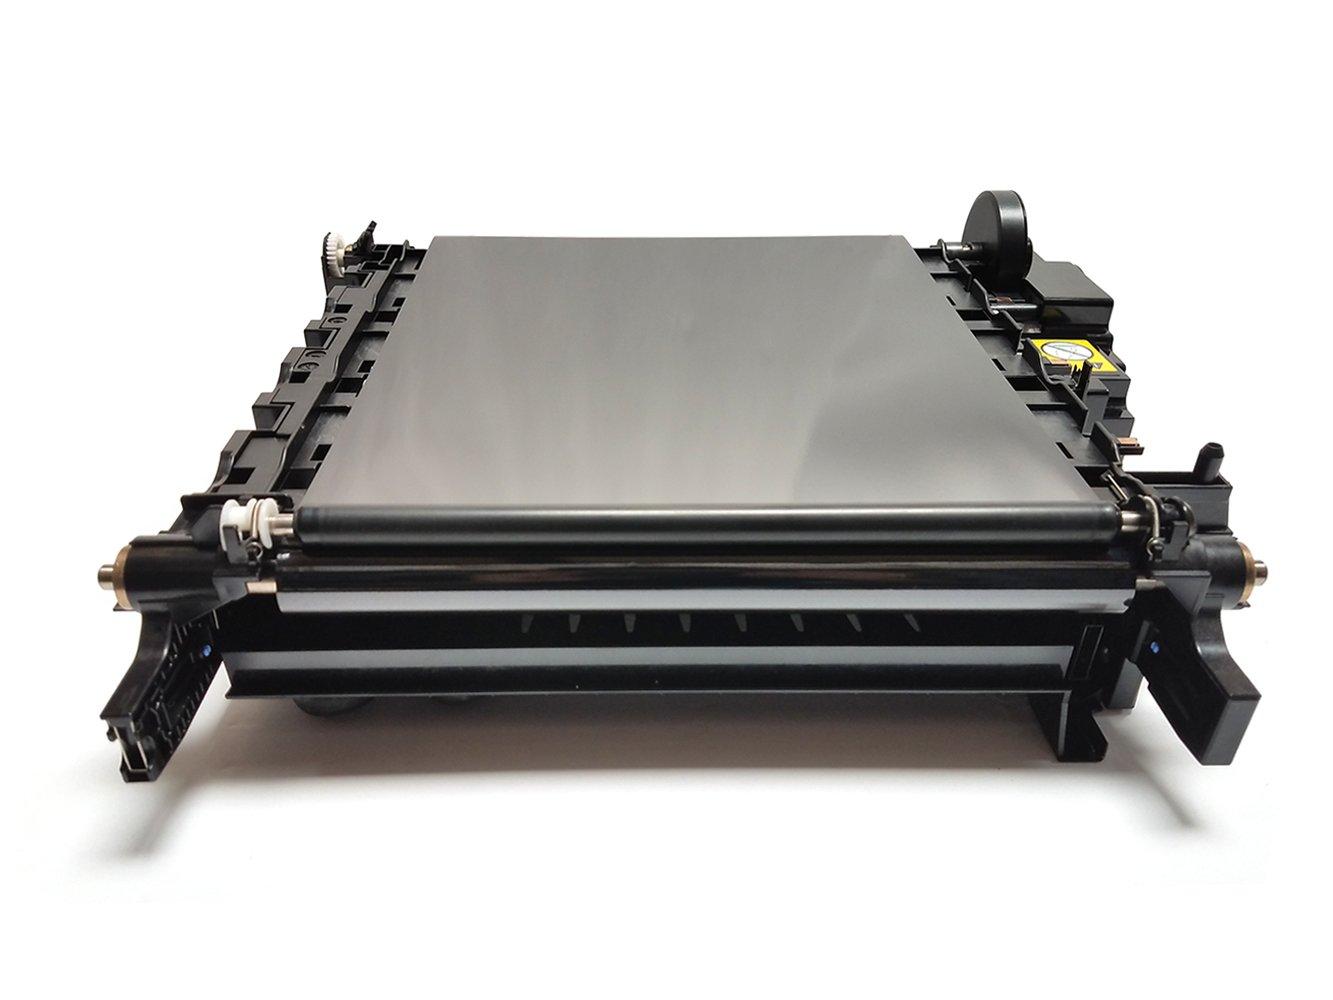 Altru Print Q7504A-TB-AP (RM1-3161) Electrostatic Transfer Belt (ETB) for HP LaserJet 4700, 4730, CP4005